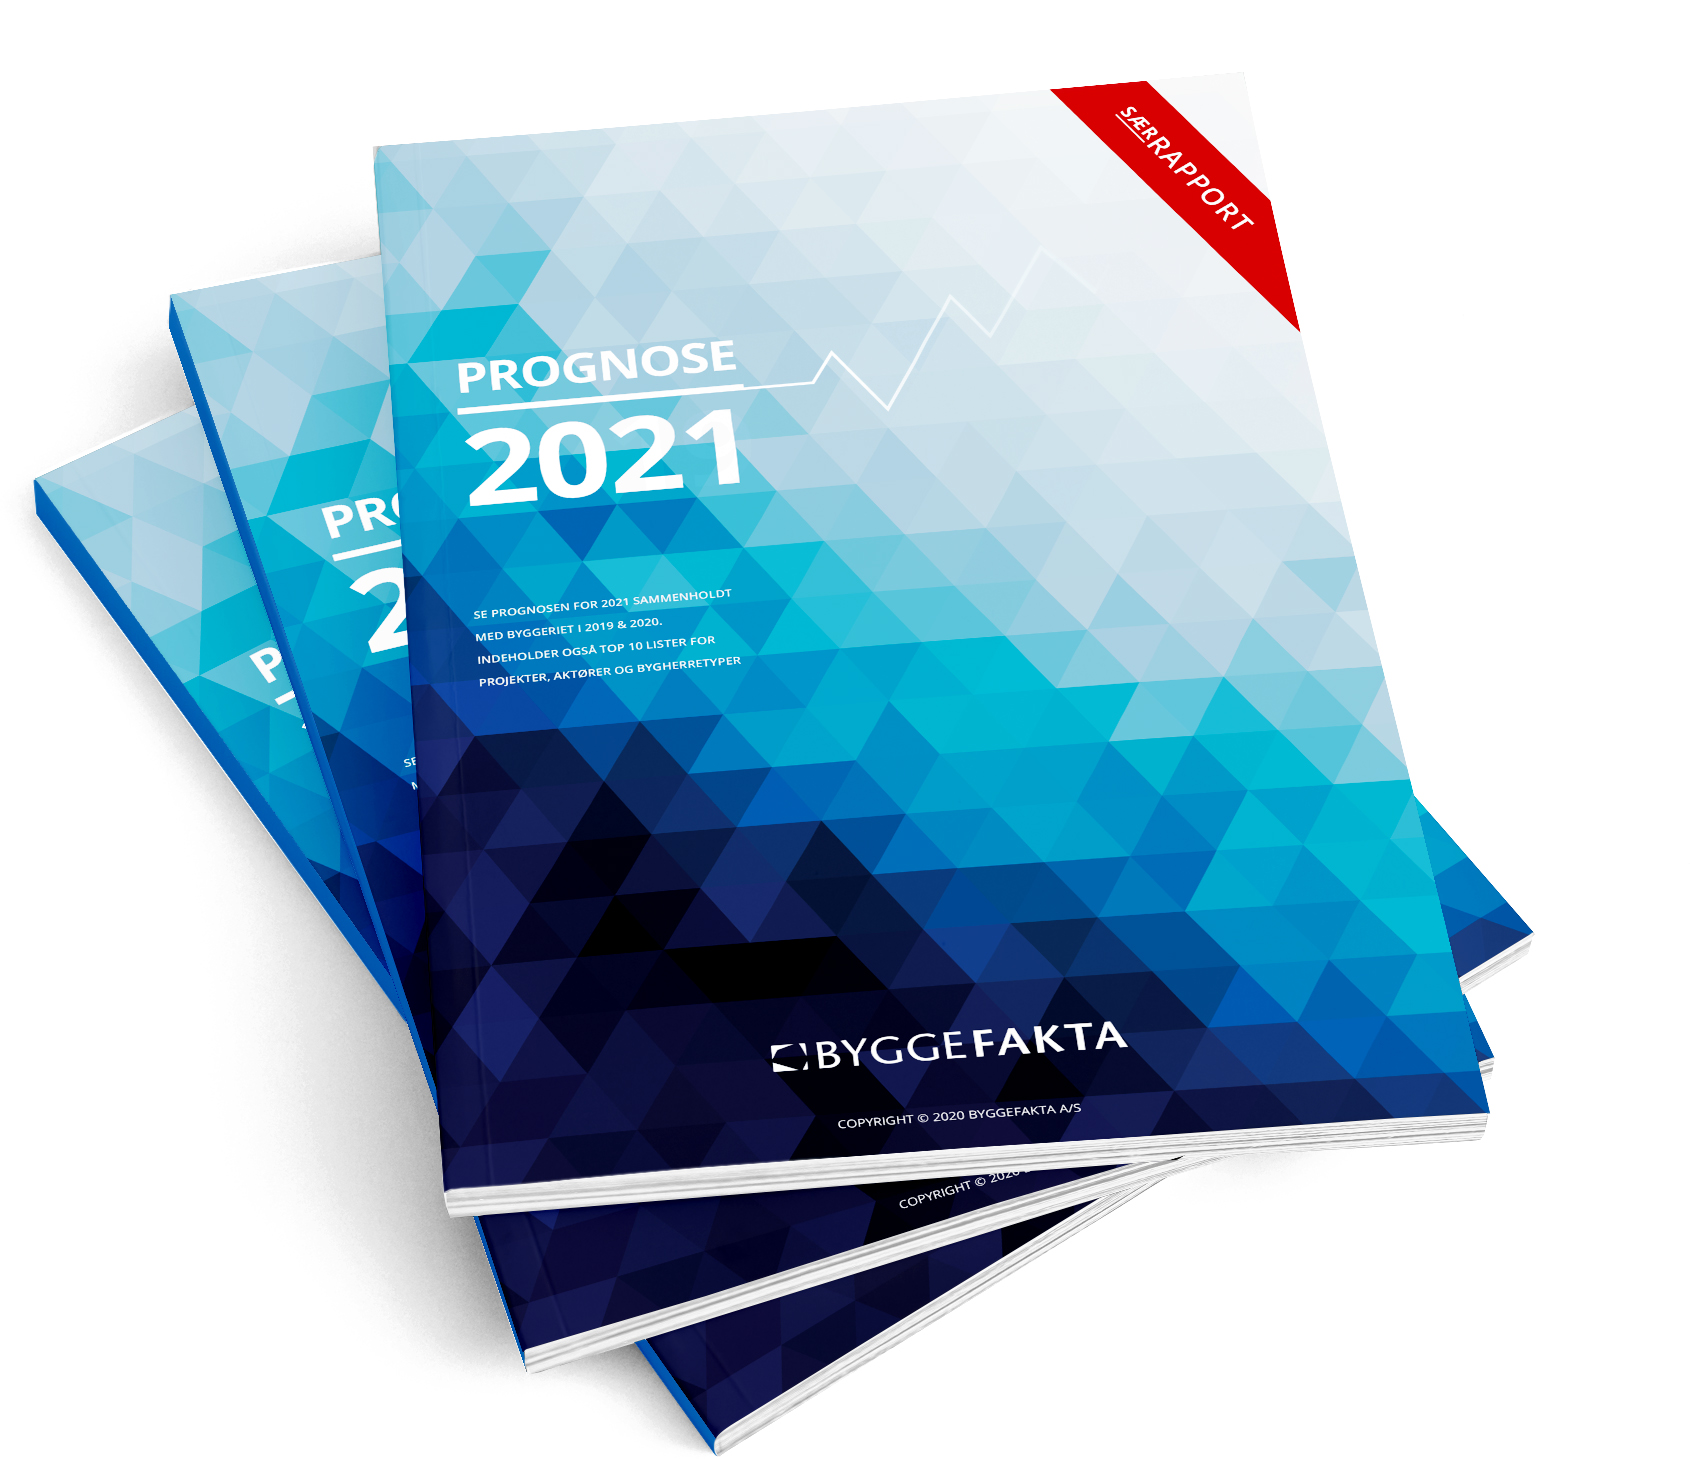 prognose2021-3rapporter-stablet